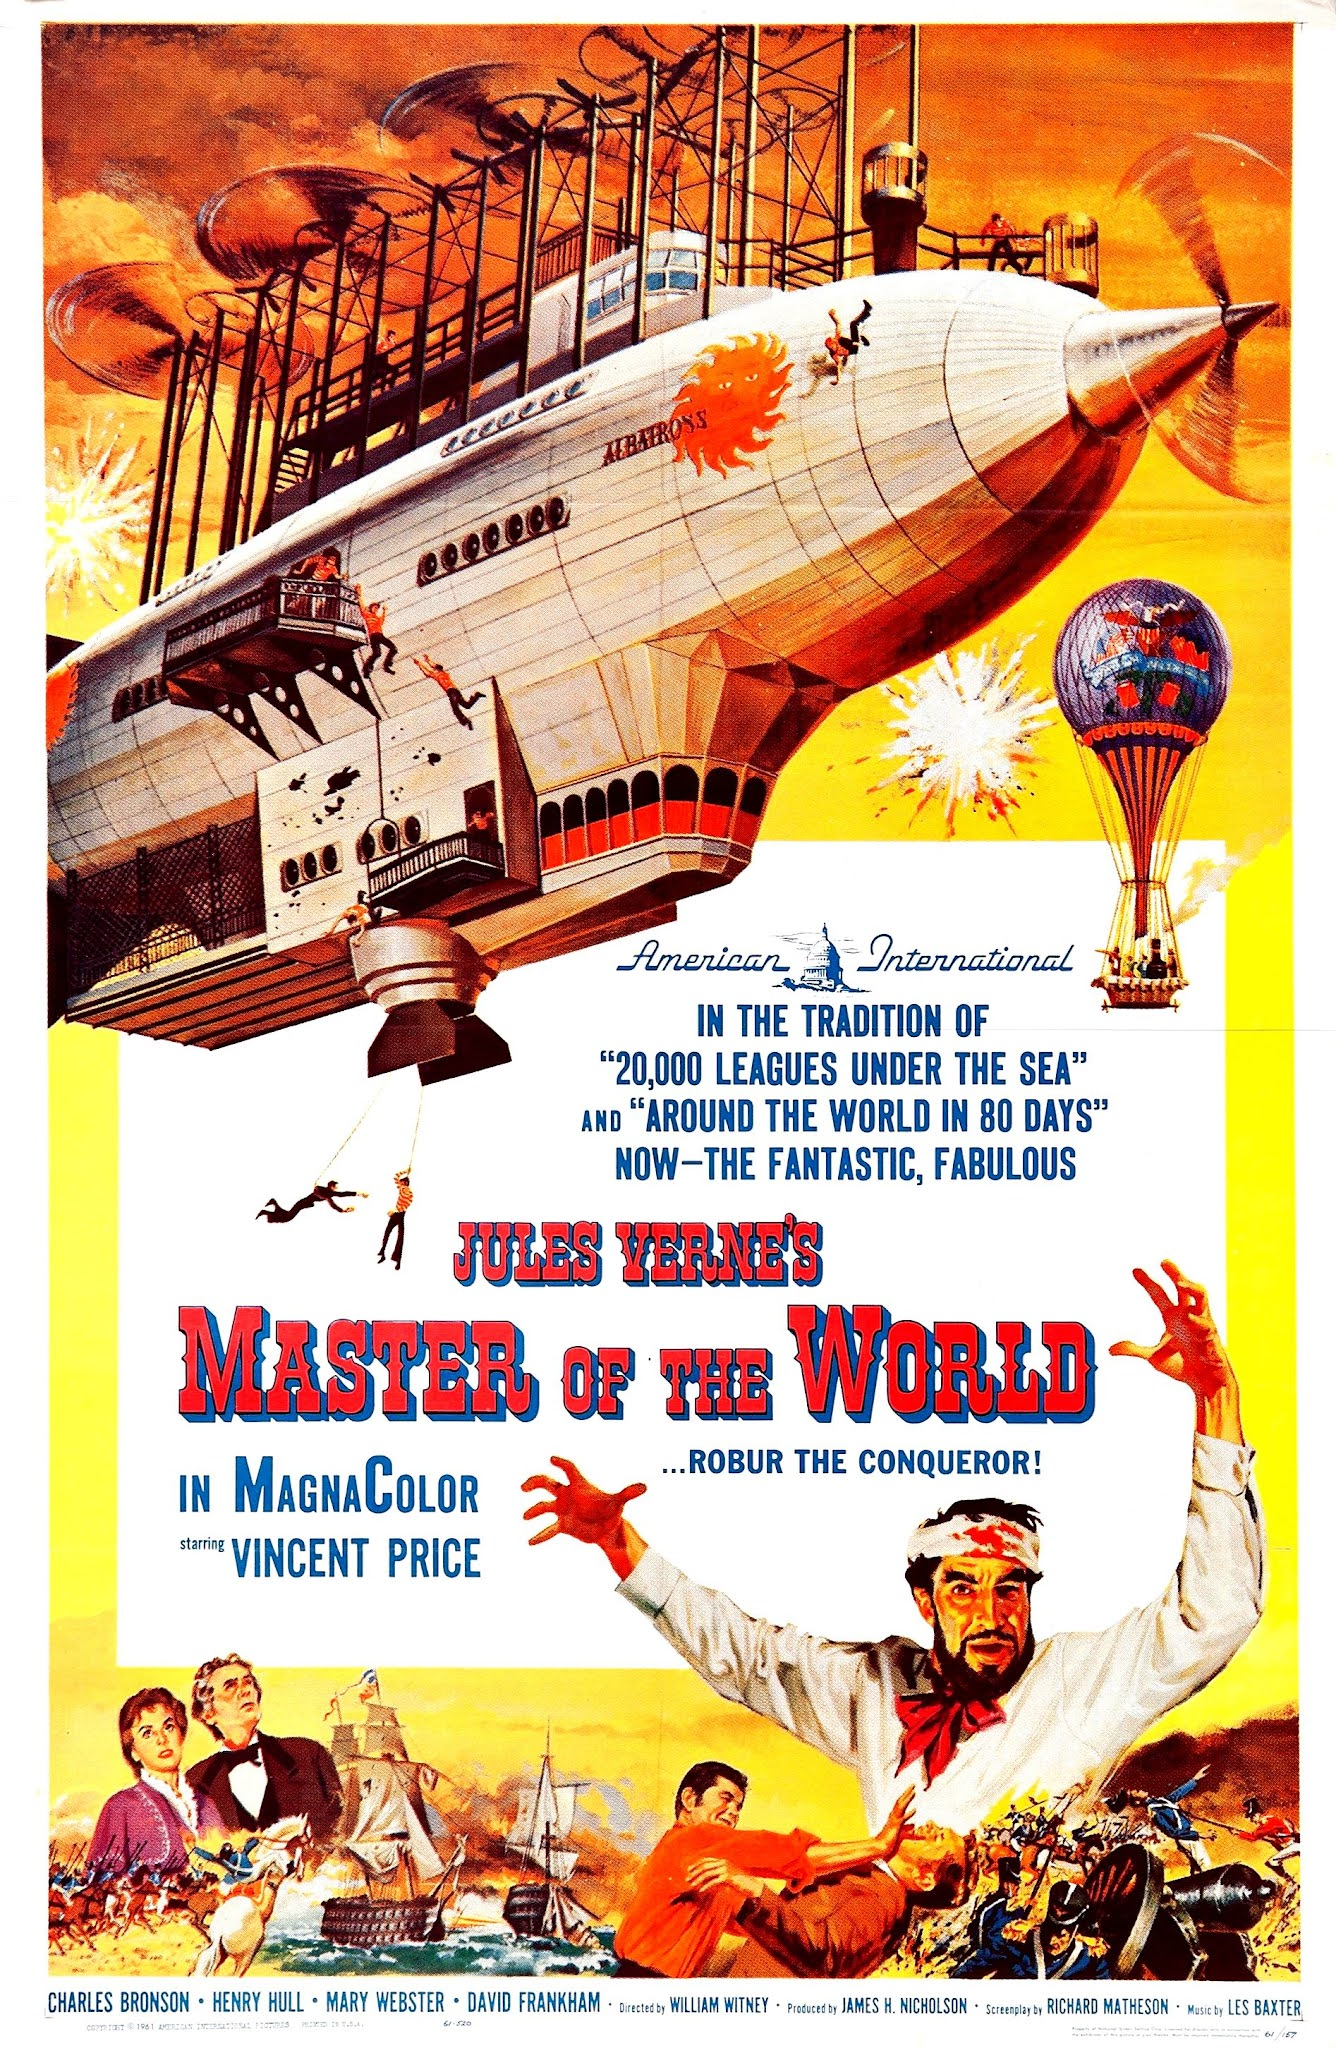 Le maître du monde (1960) William Witney - Master of the world (09.09.1960 / 1960)